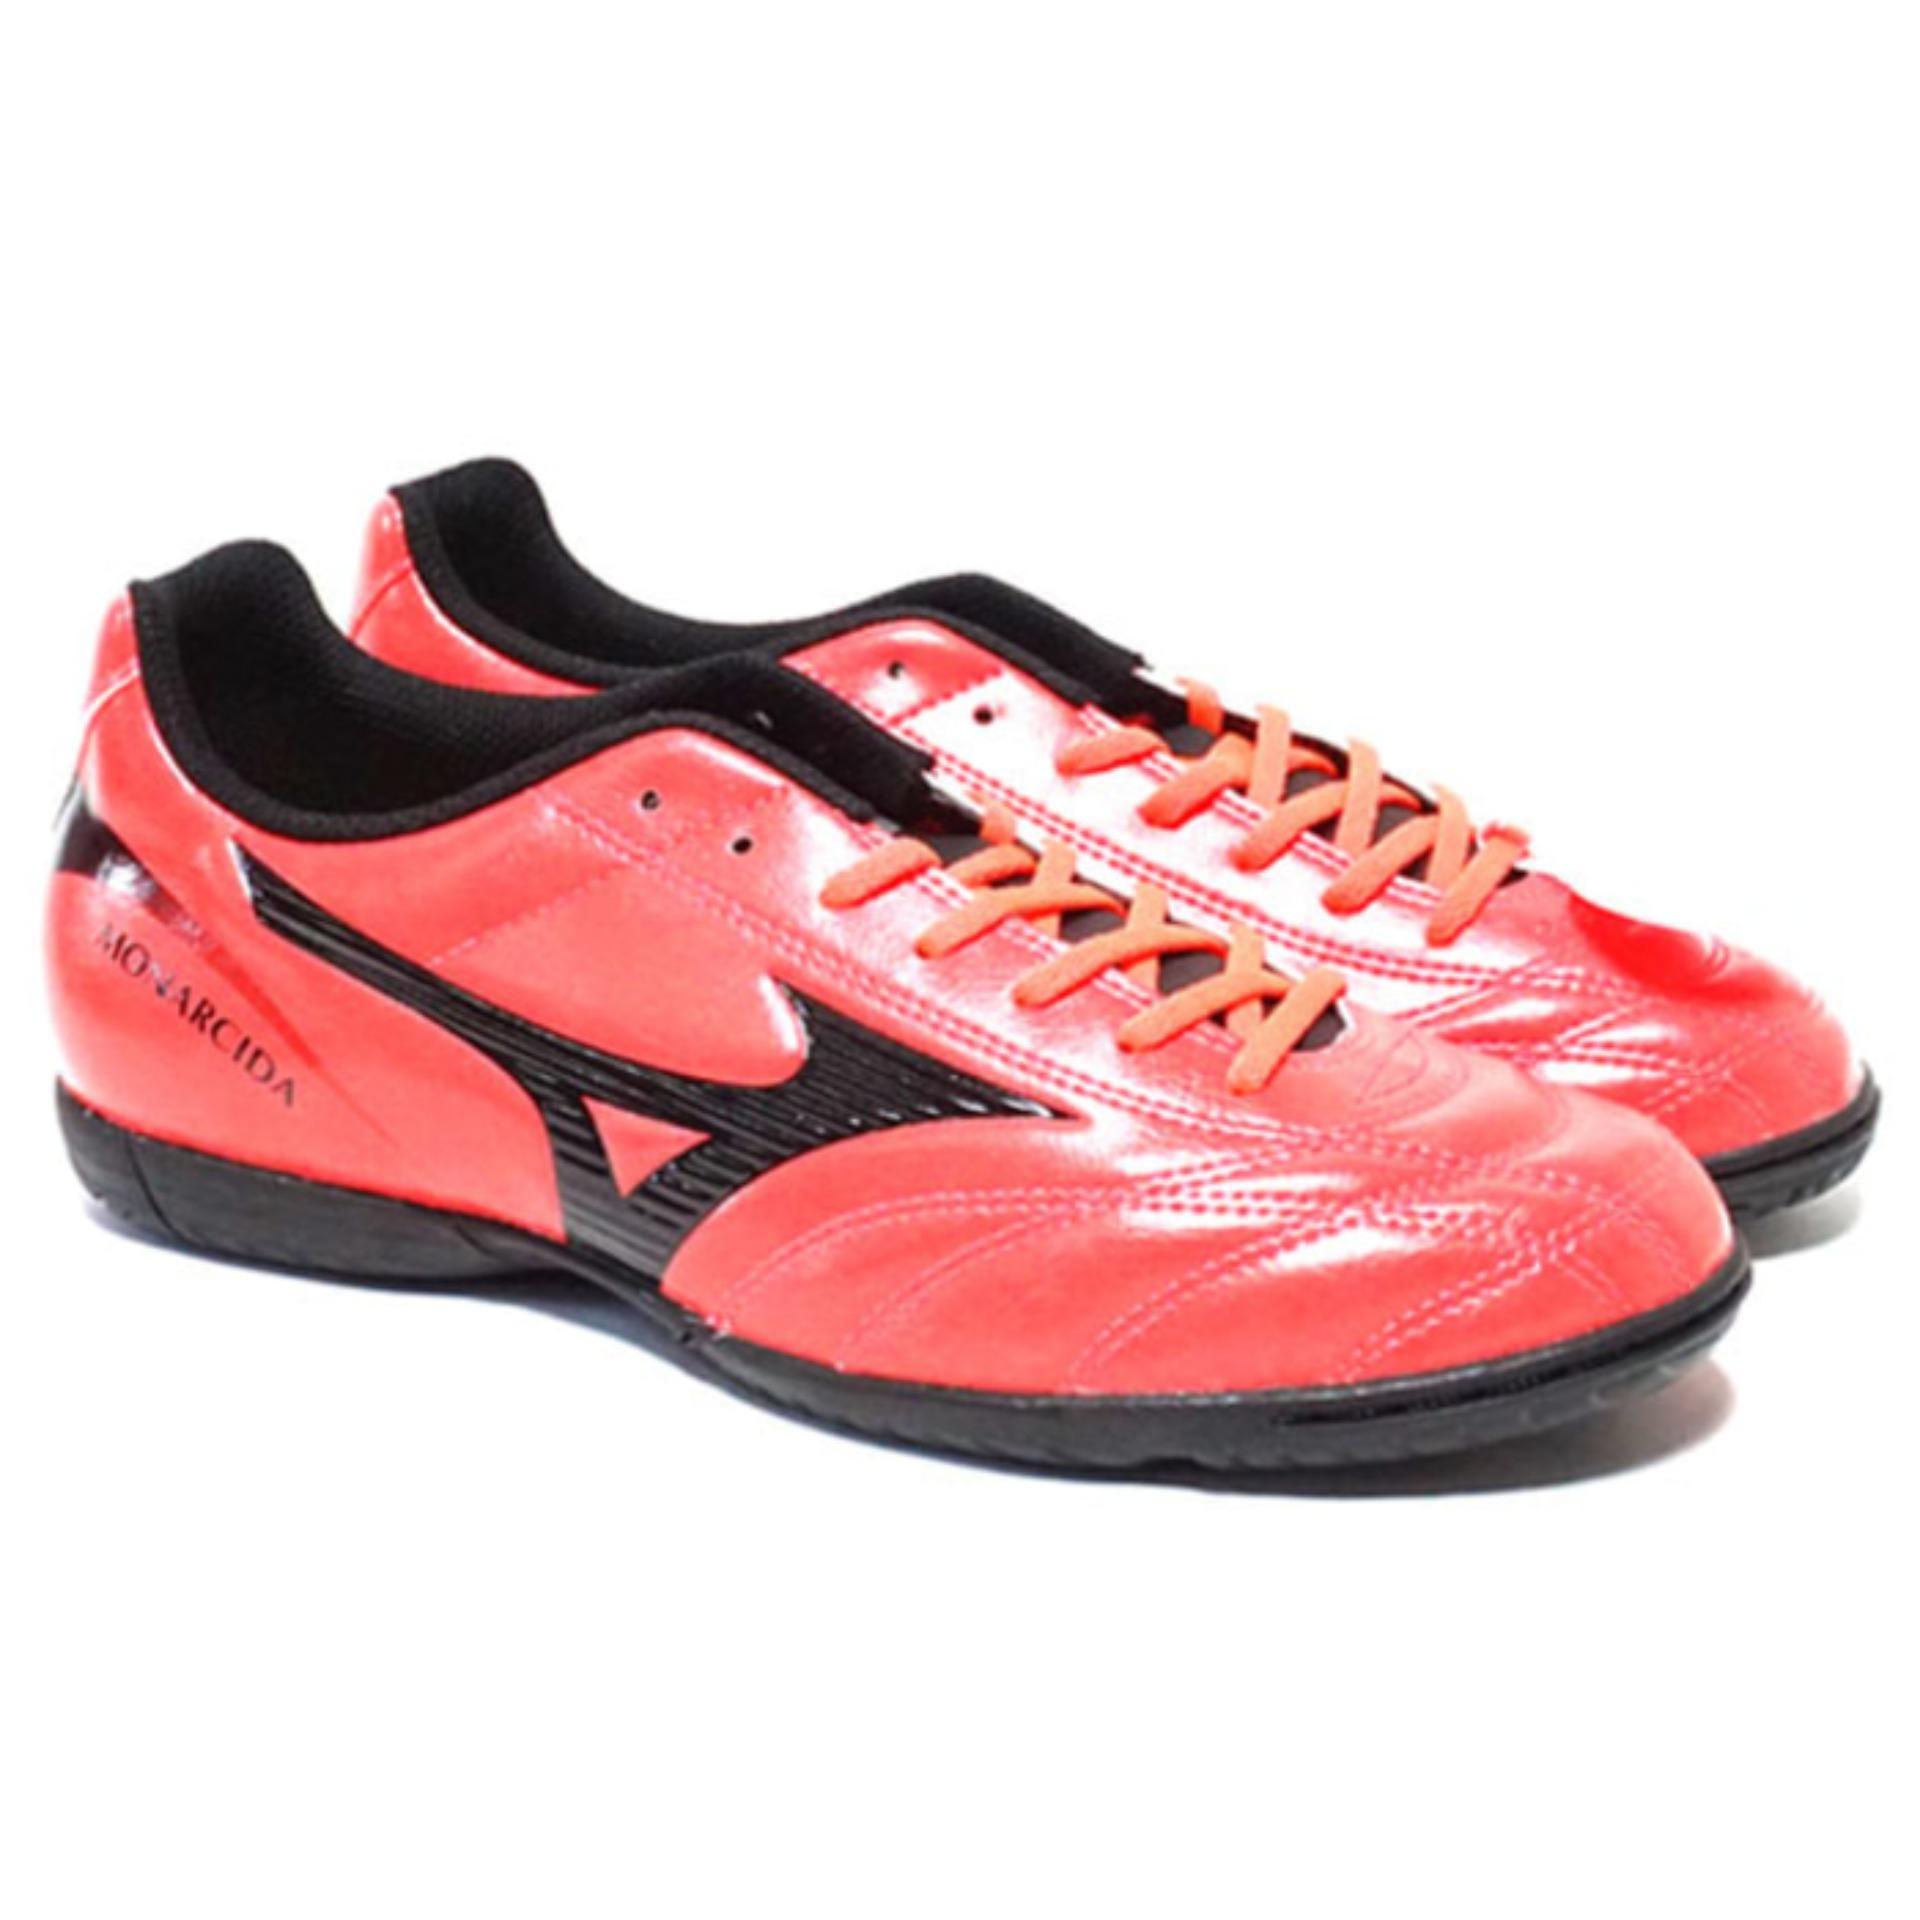 Vinson Massif Hitam Biru Gem WIKIPRICE Source · Harga Sepatu Running Specs. Source · Sepatu